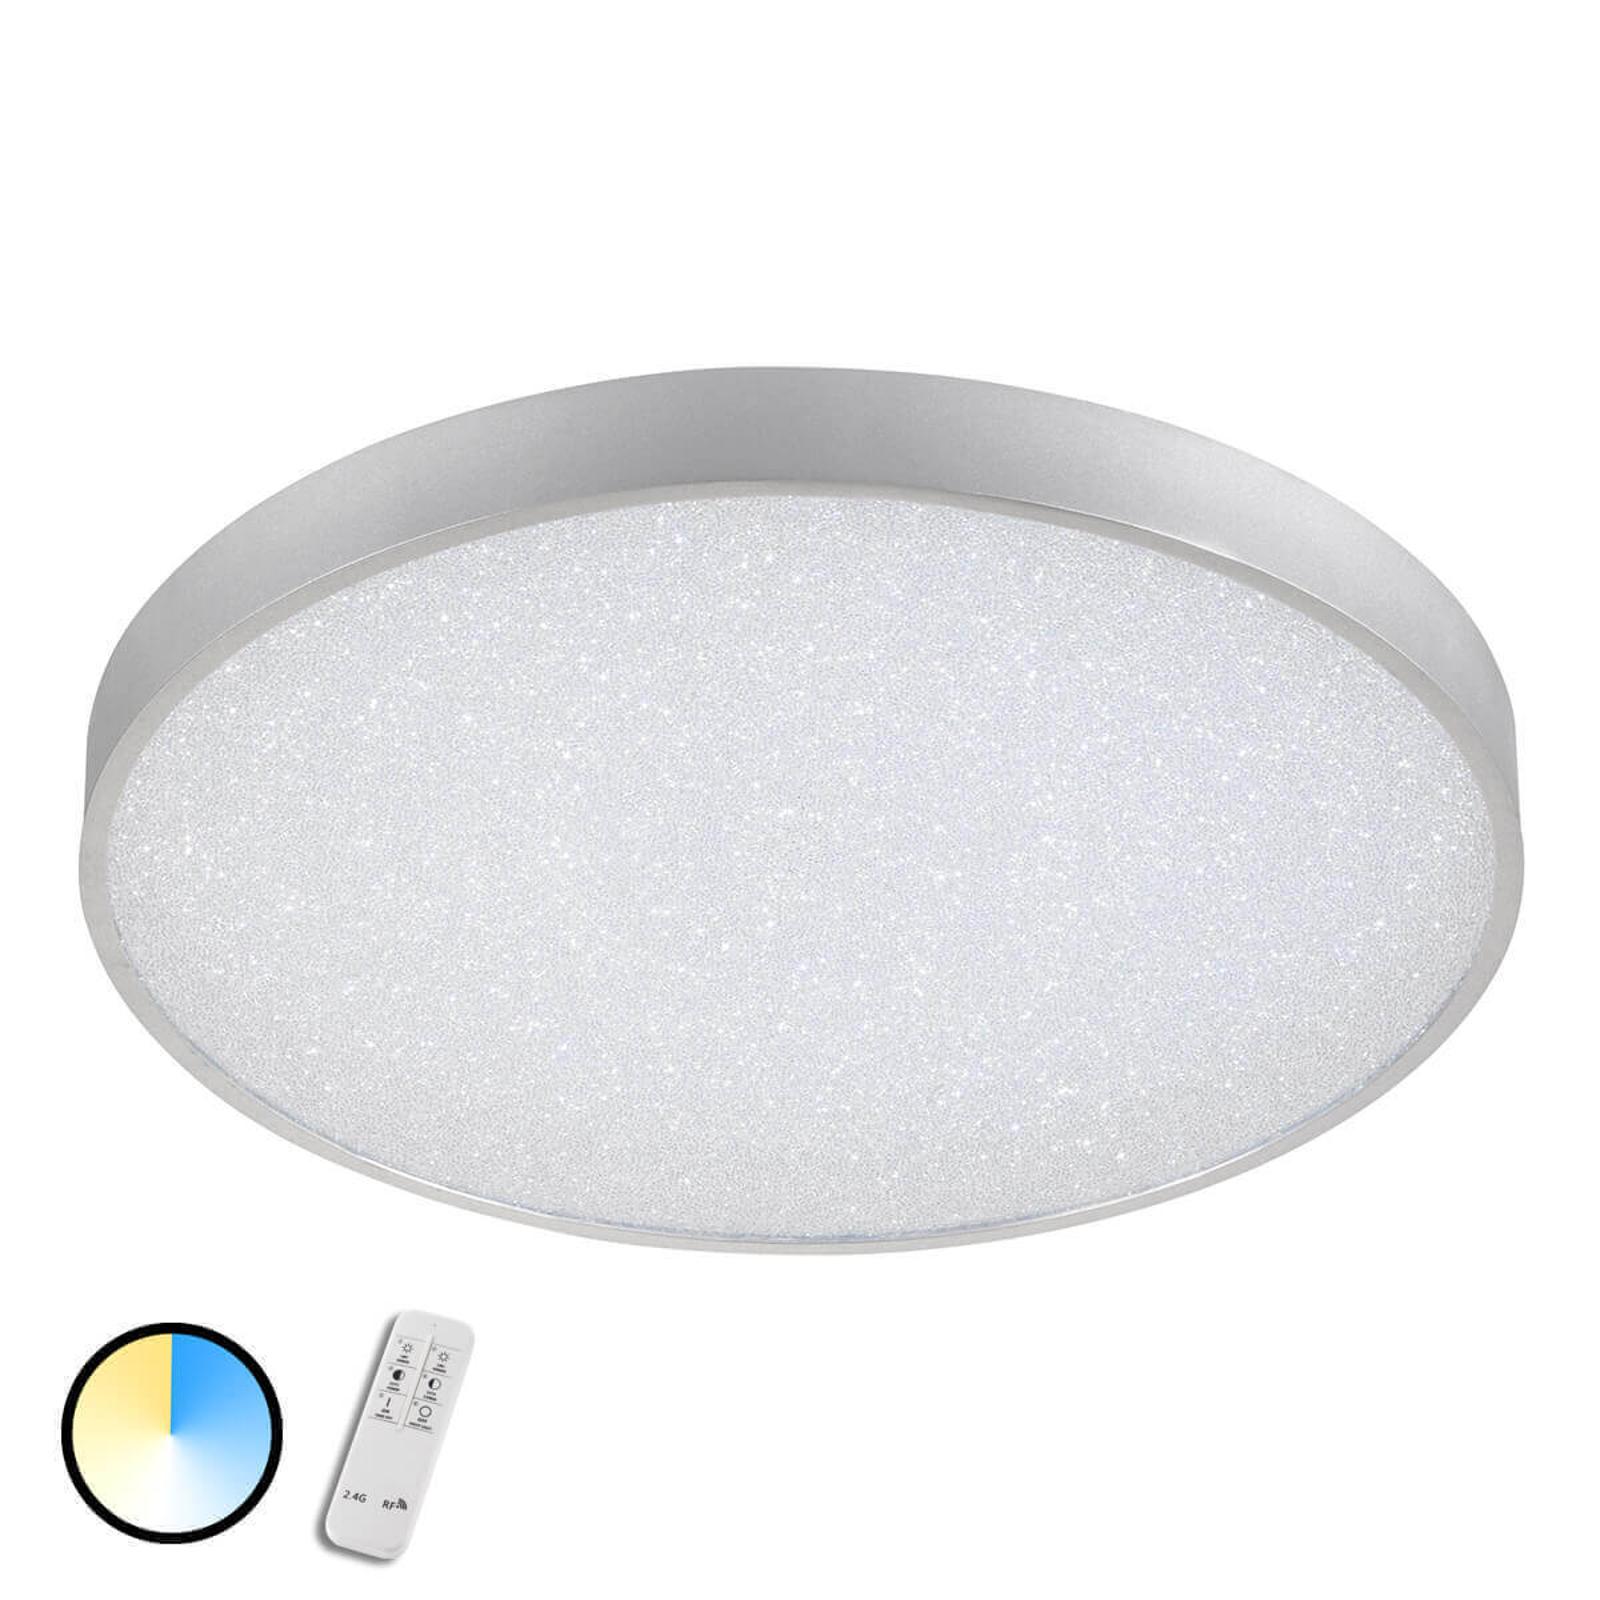 LED-taklampe Glam, rund, med fjernkontroll